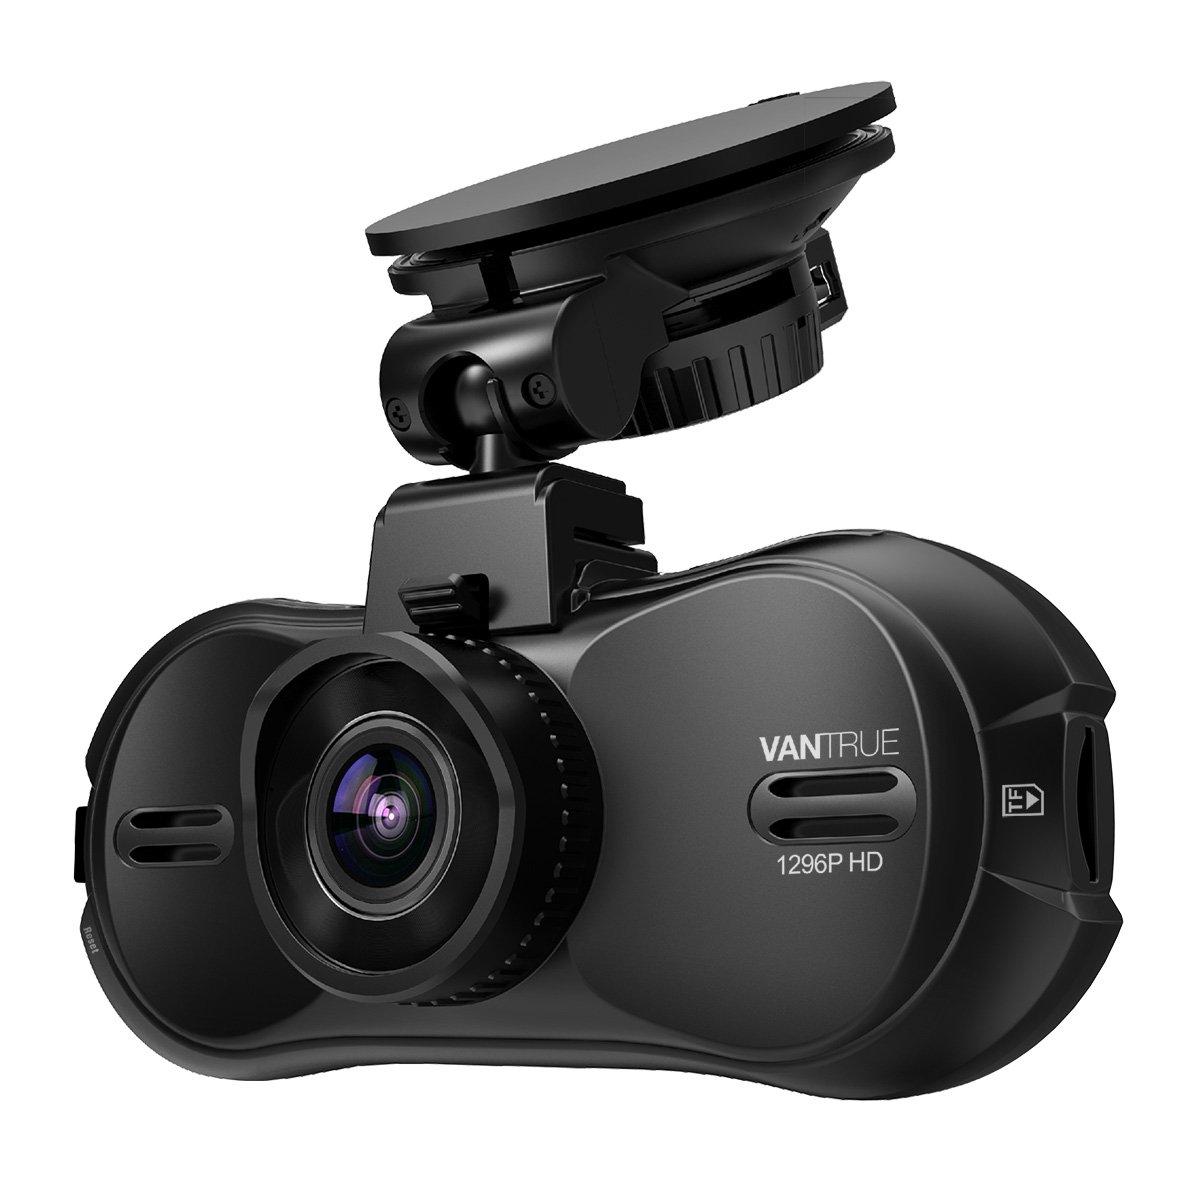 Vantrue R3 Rechargeable 2K Dash Cam Super HD 2304x1296P 1920x1080P 170° Car Camera Super HDR Night Vision, 24 Hours Parking Mode, Motion Sensor, Support up to 256GB, Optional GPS for 12V-24V Car Truck